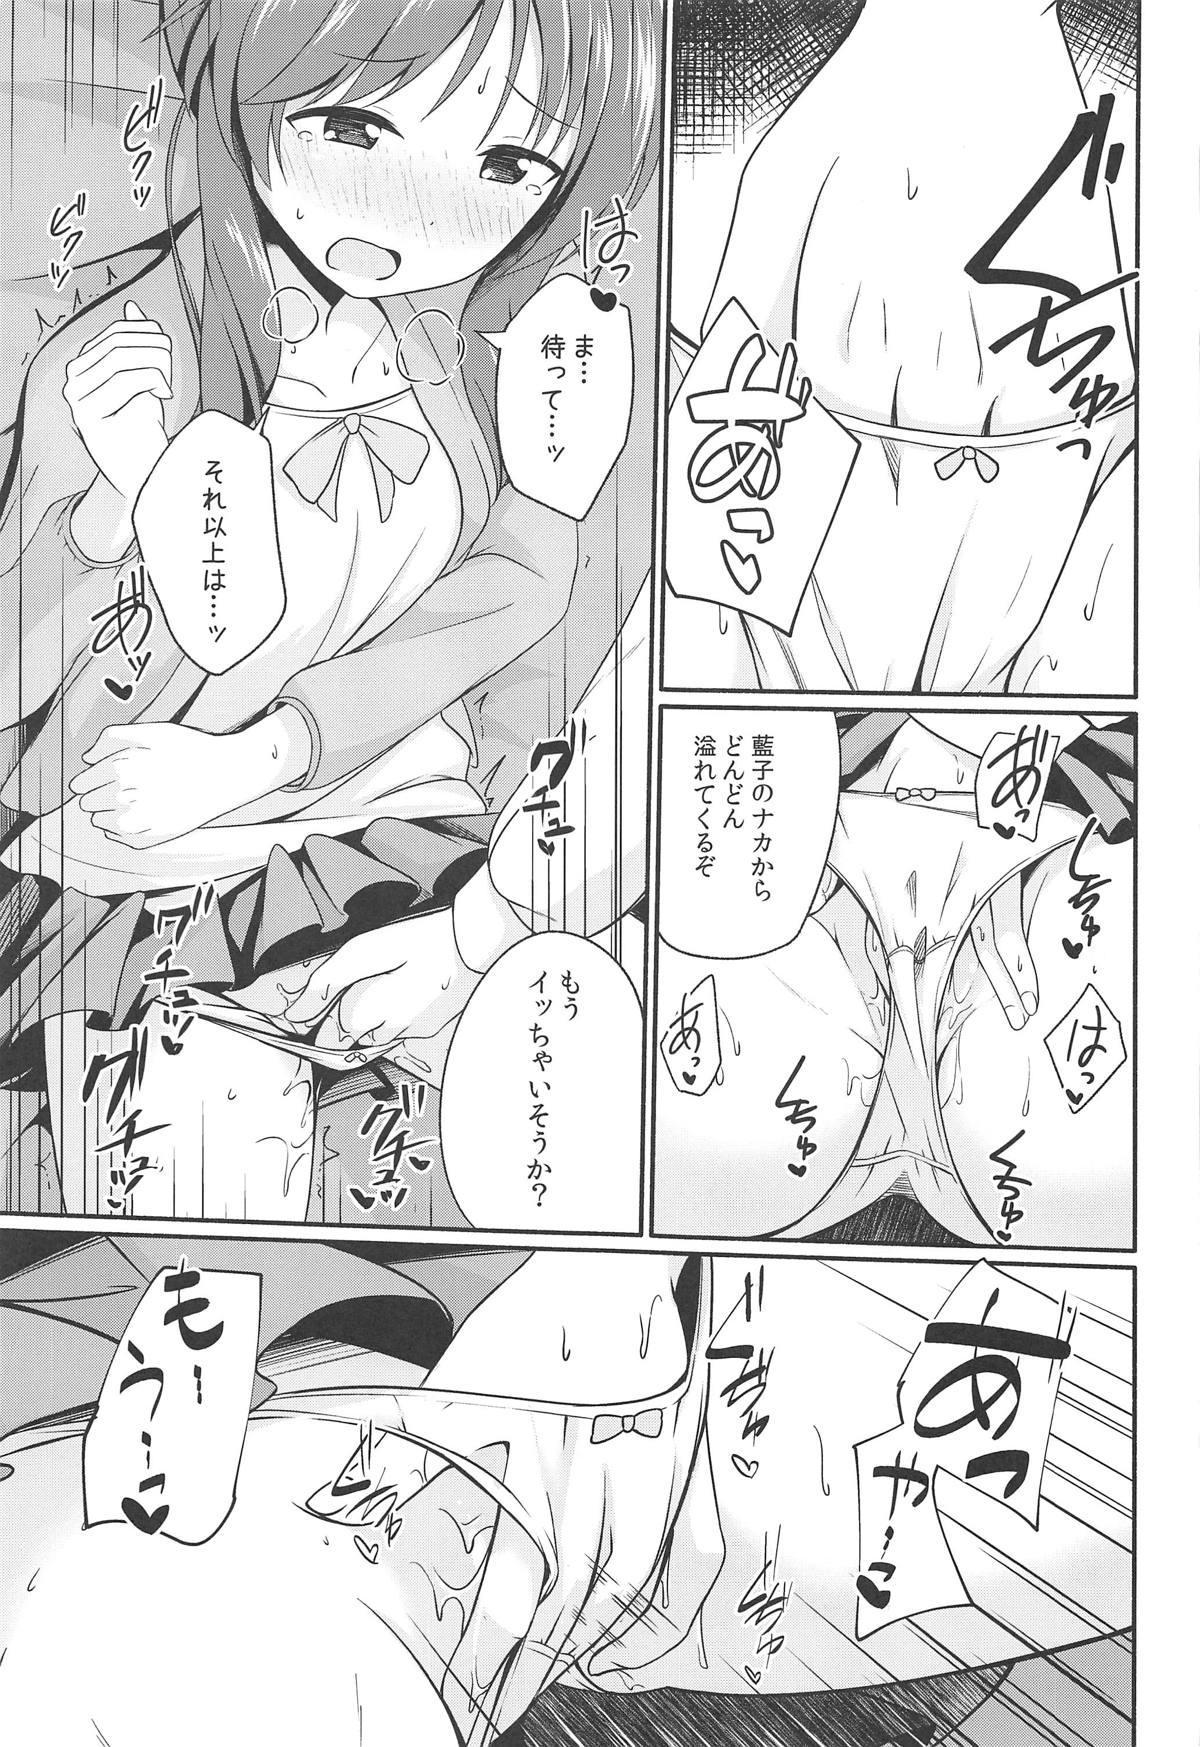 Aiko Myu Endless 7 9